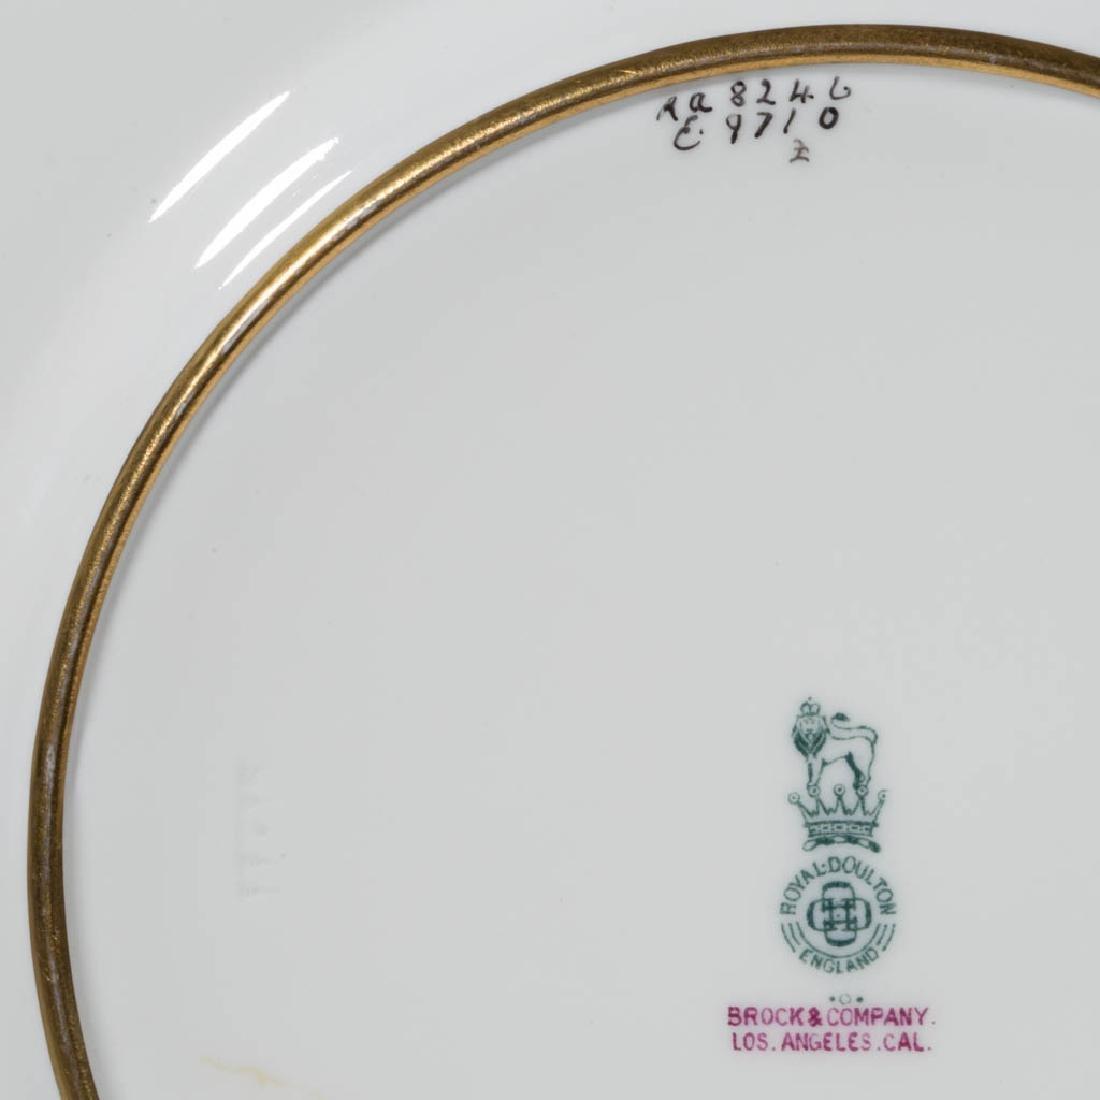 ENGLISH ROYAL DOULTON CERAMIC DINNER PLATES, SET OF 12 - 2